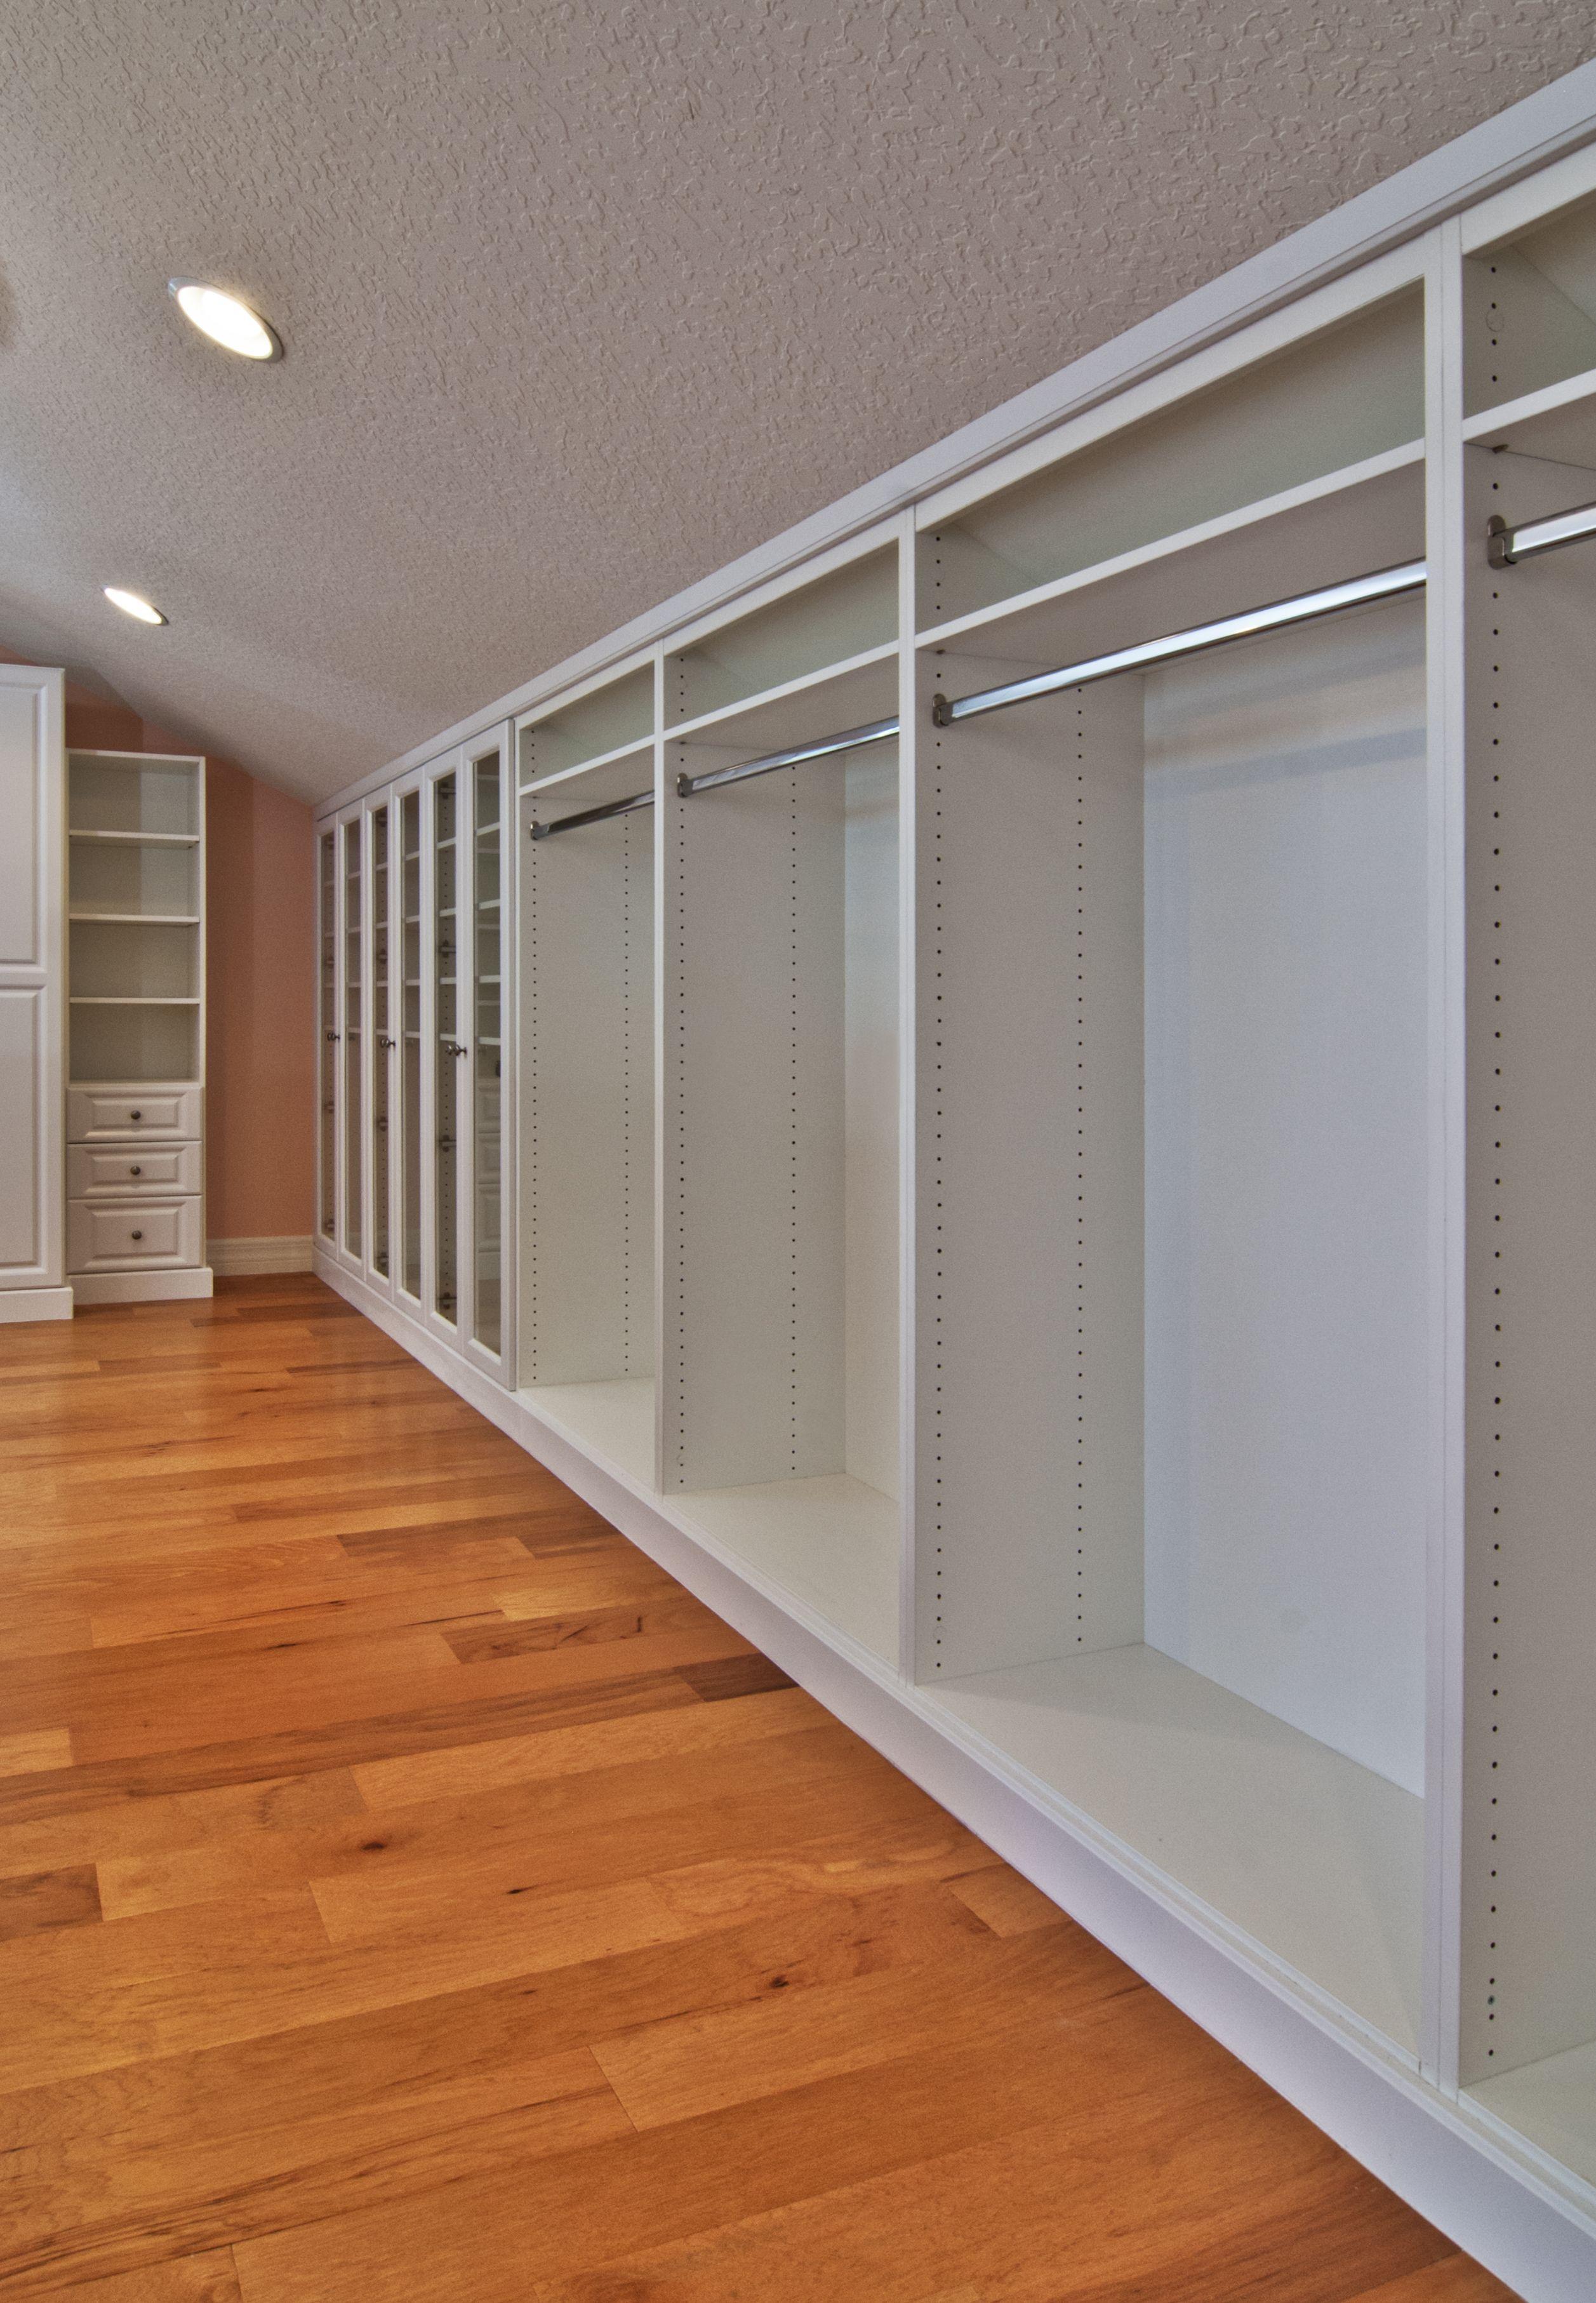 Master Closet White Inside Finished Attic With Angled